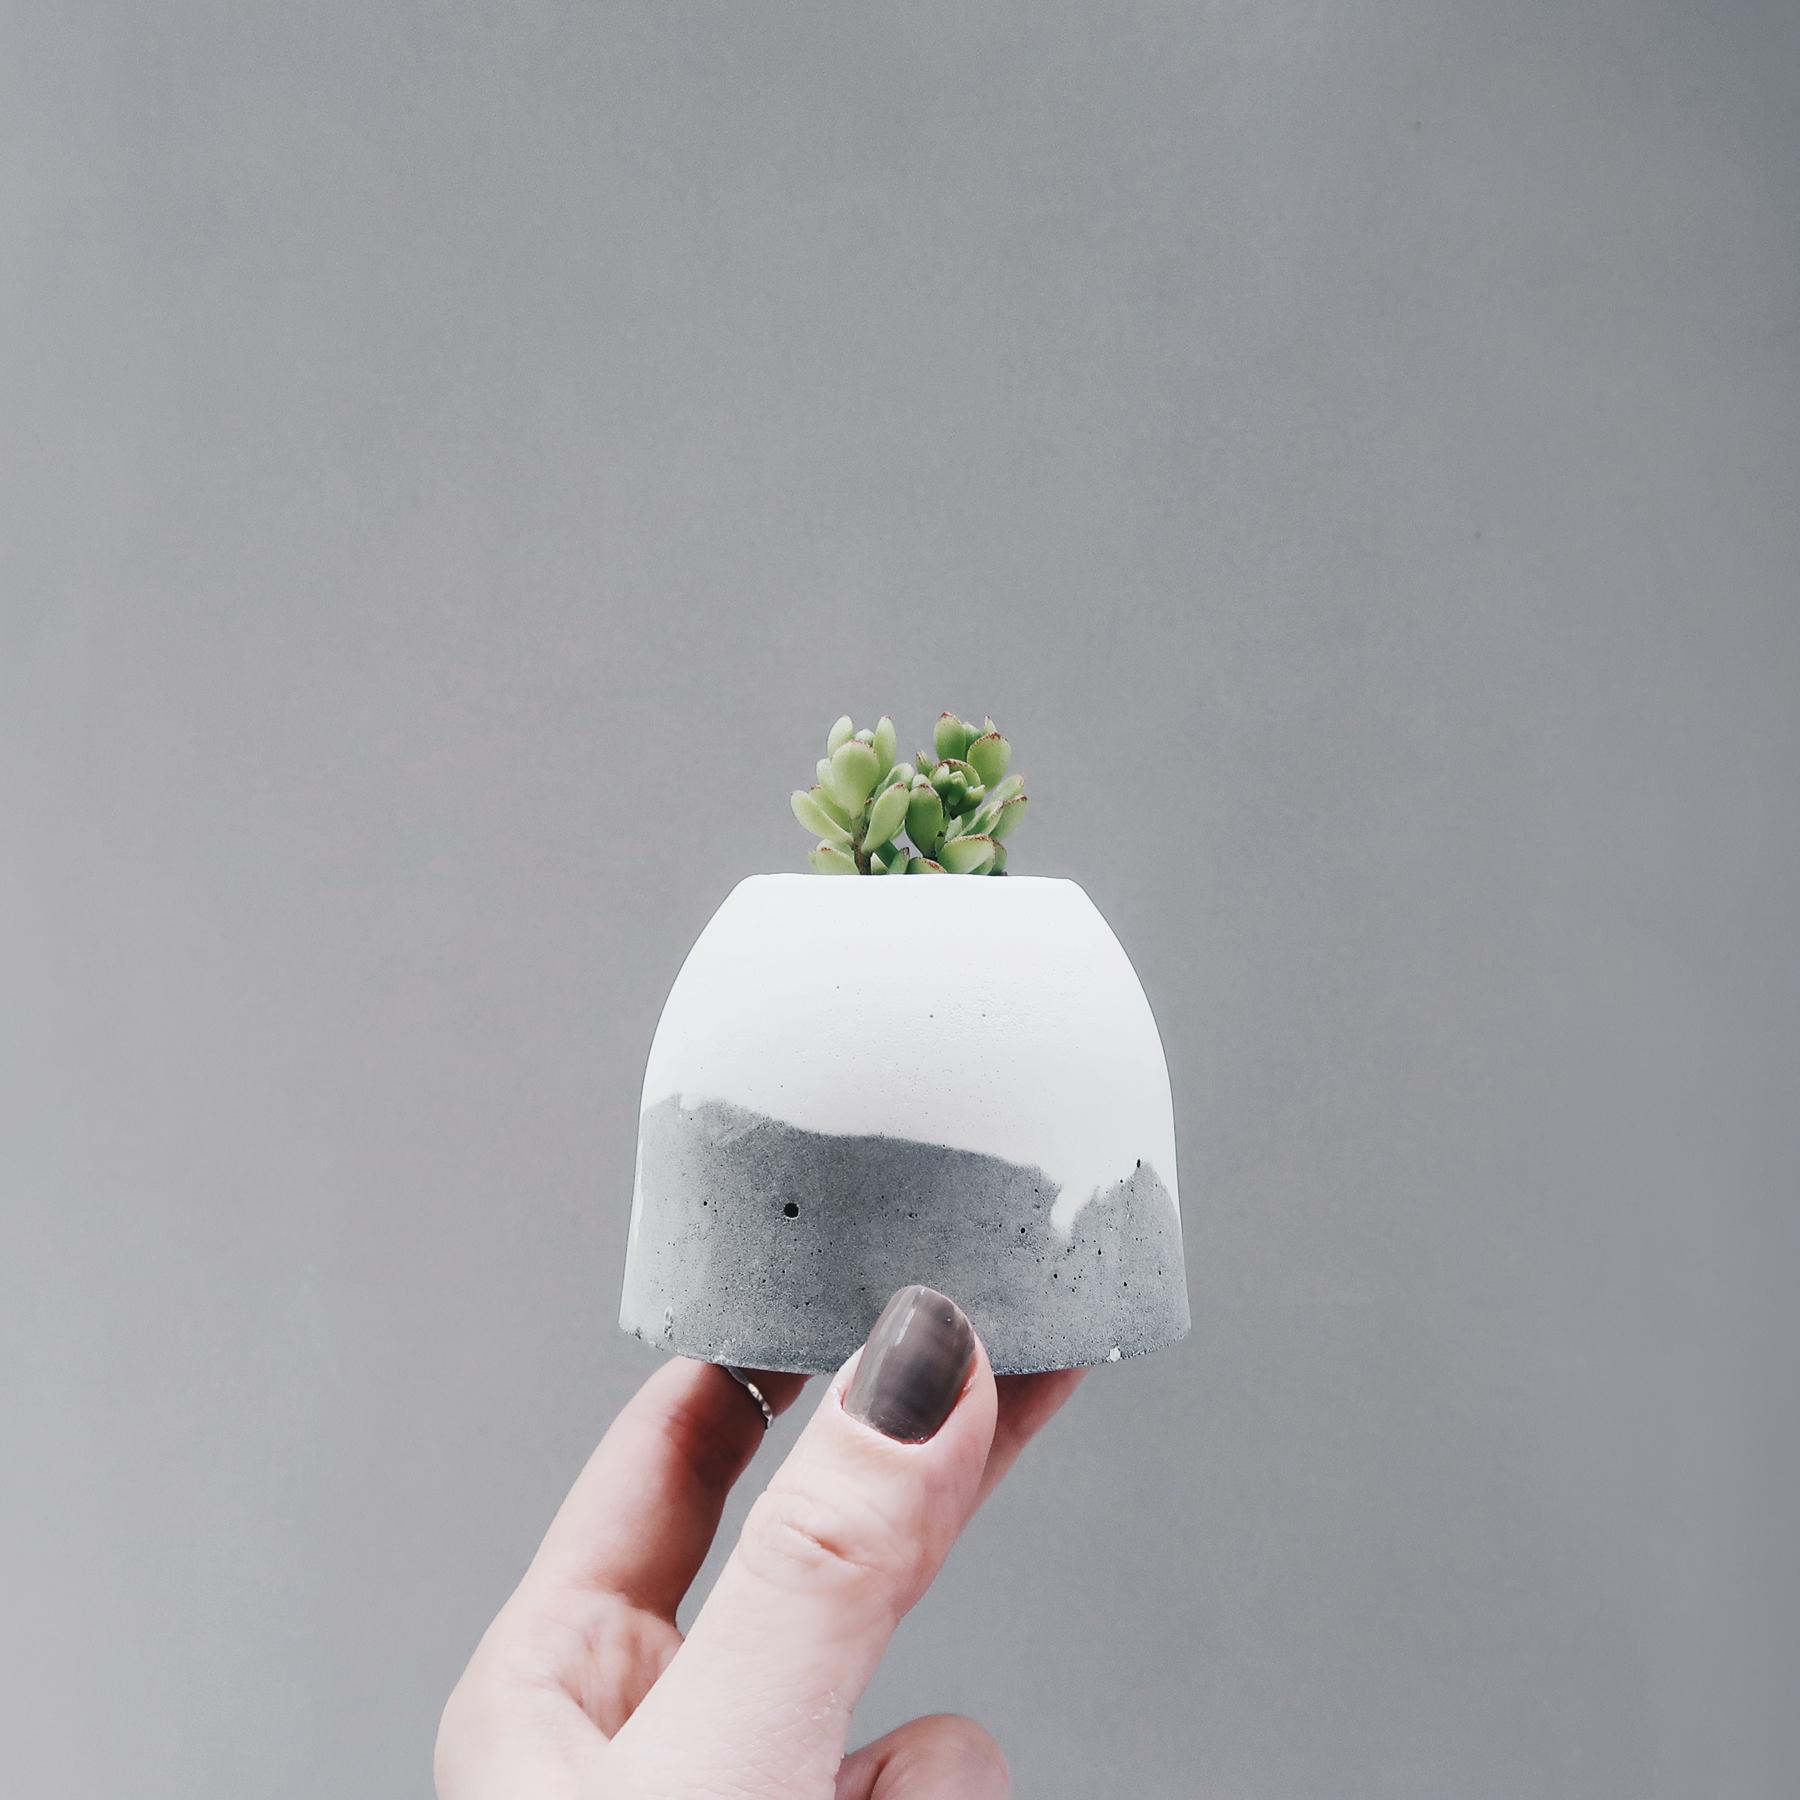 HILL ISLAND 小島山多肉雪景水泥盆栽 / Succulent Snowing concrete planter